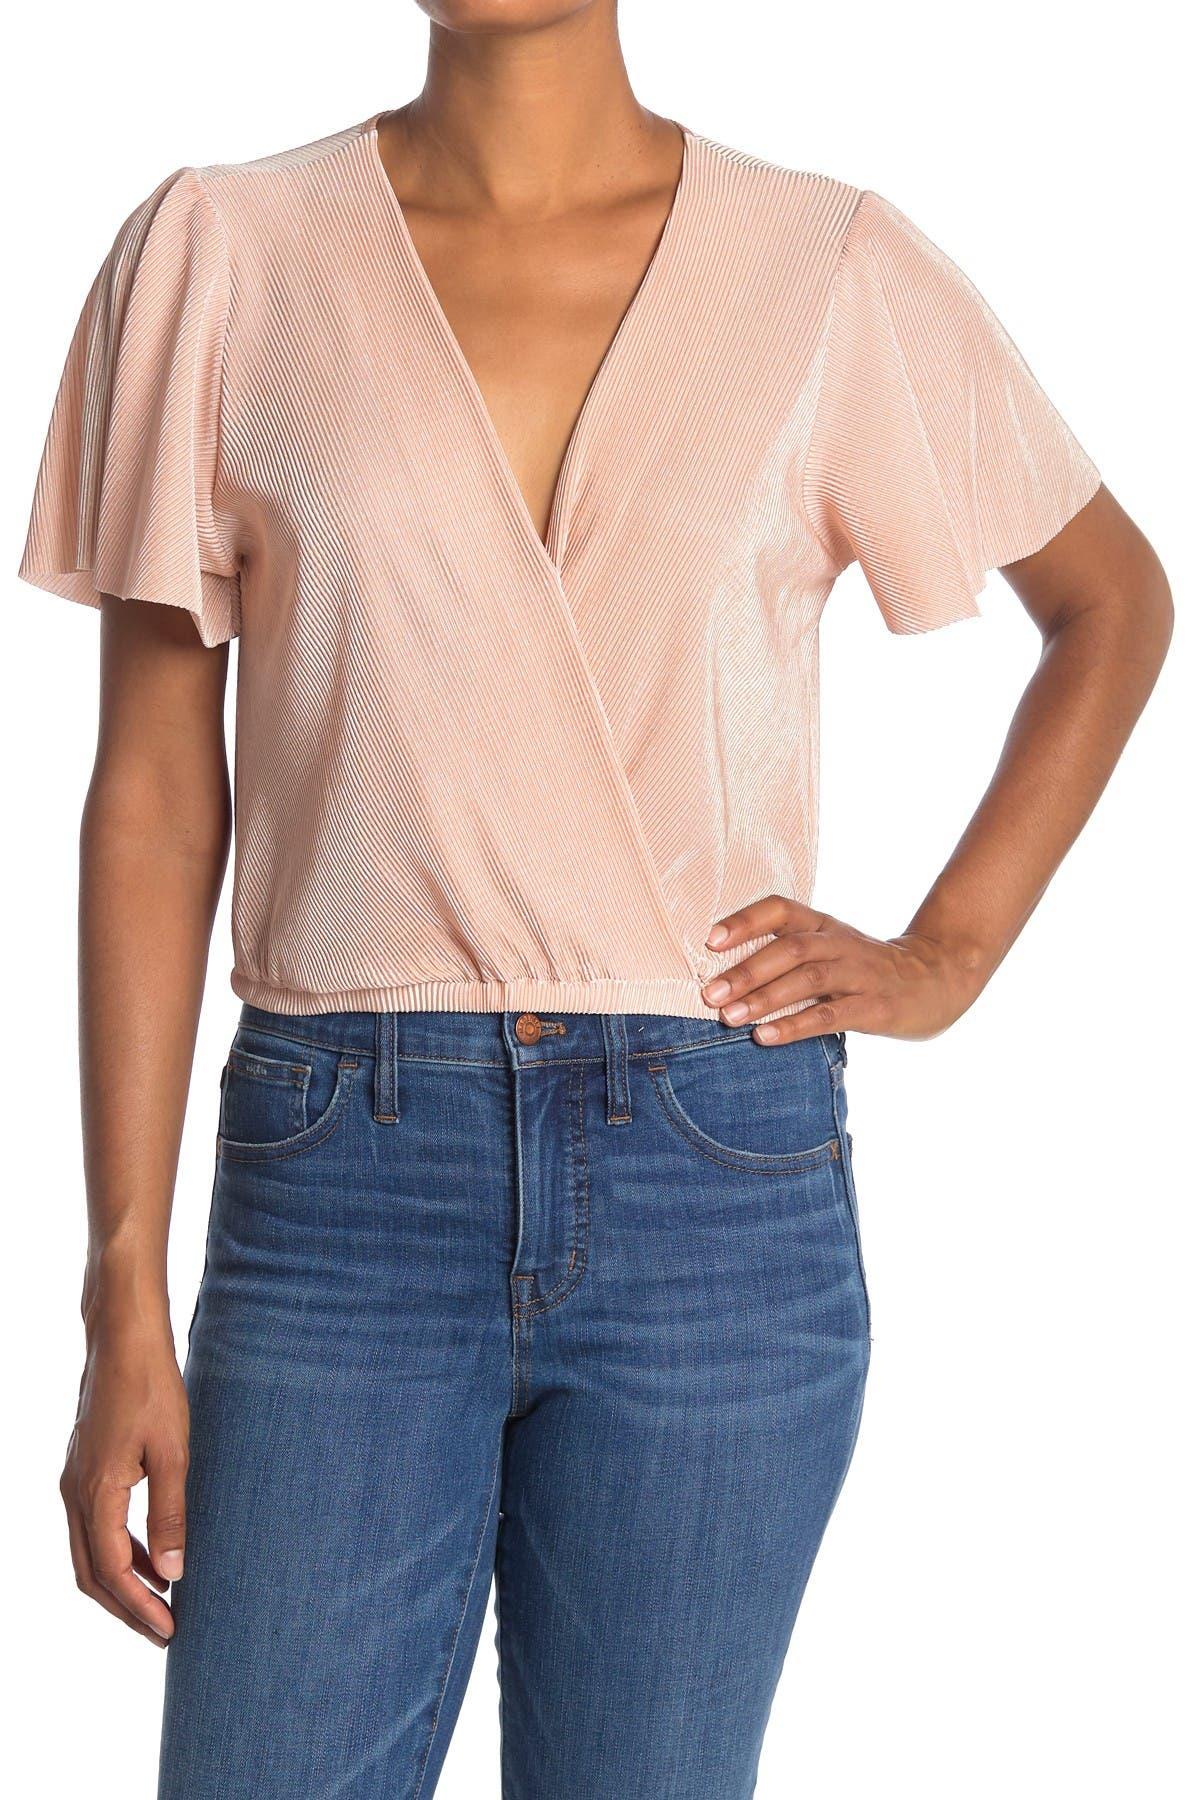 Image of ASTR the Label Short Sleeve Plisse Top